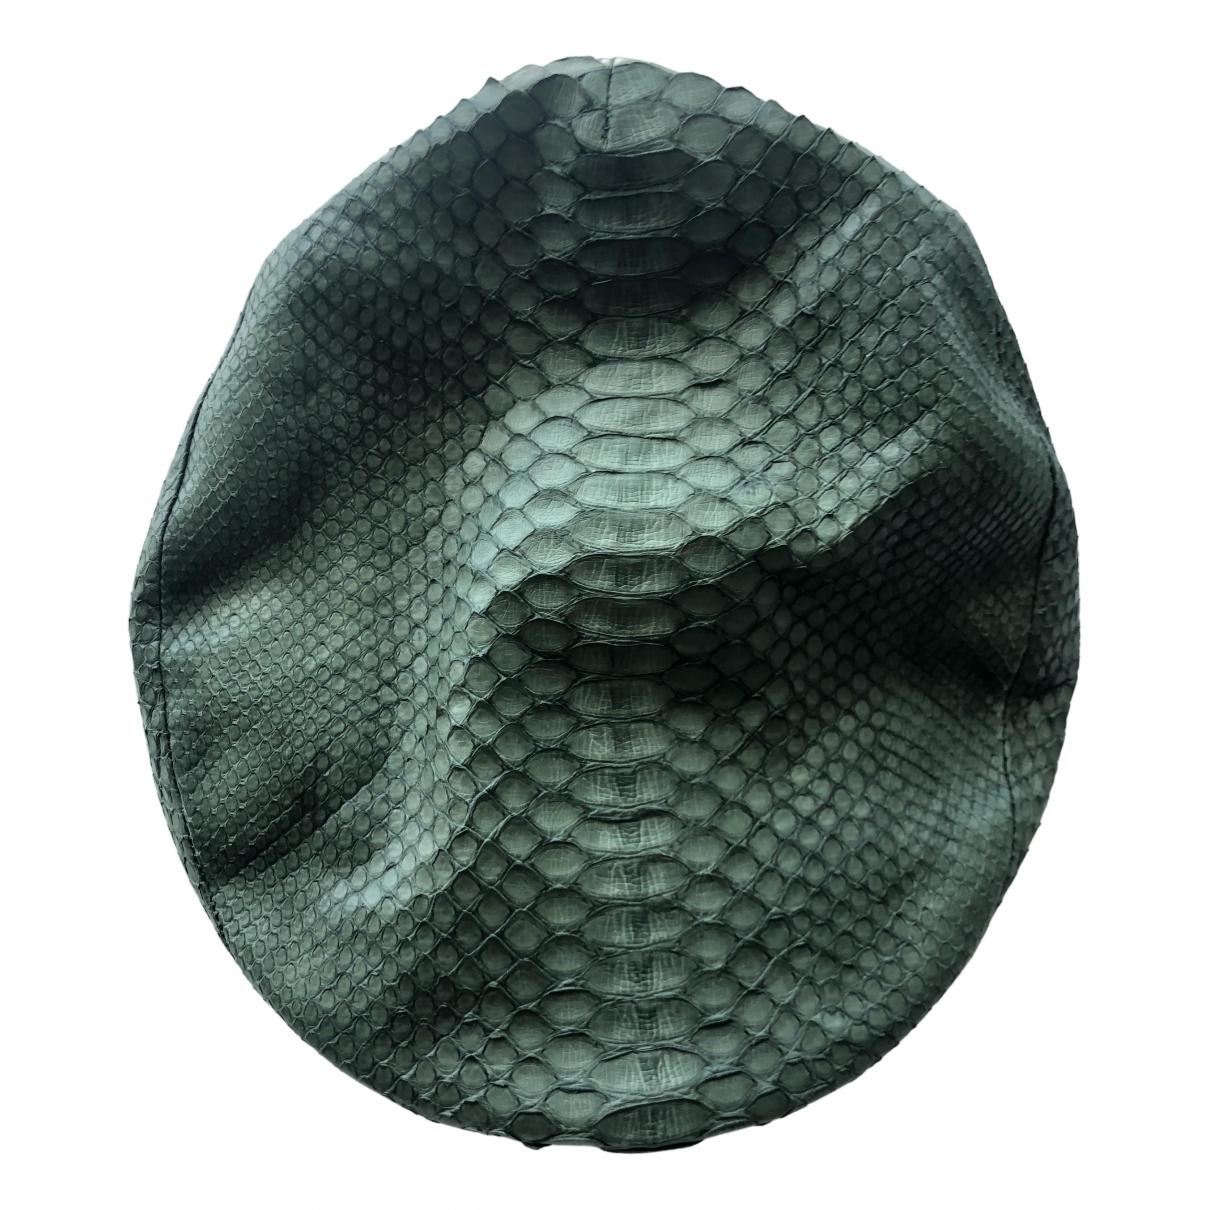 Giorgio Armani N Green Leather hat for Women 57 cm